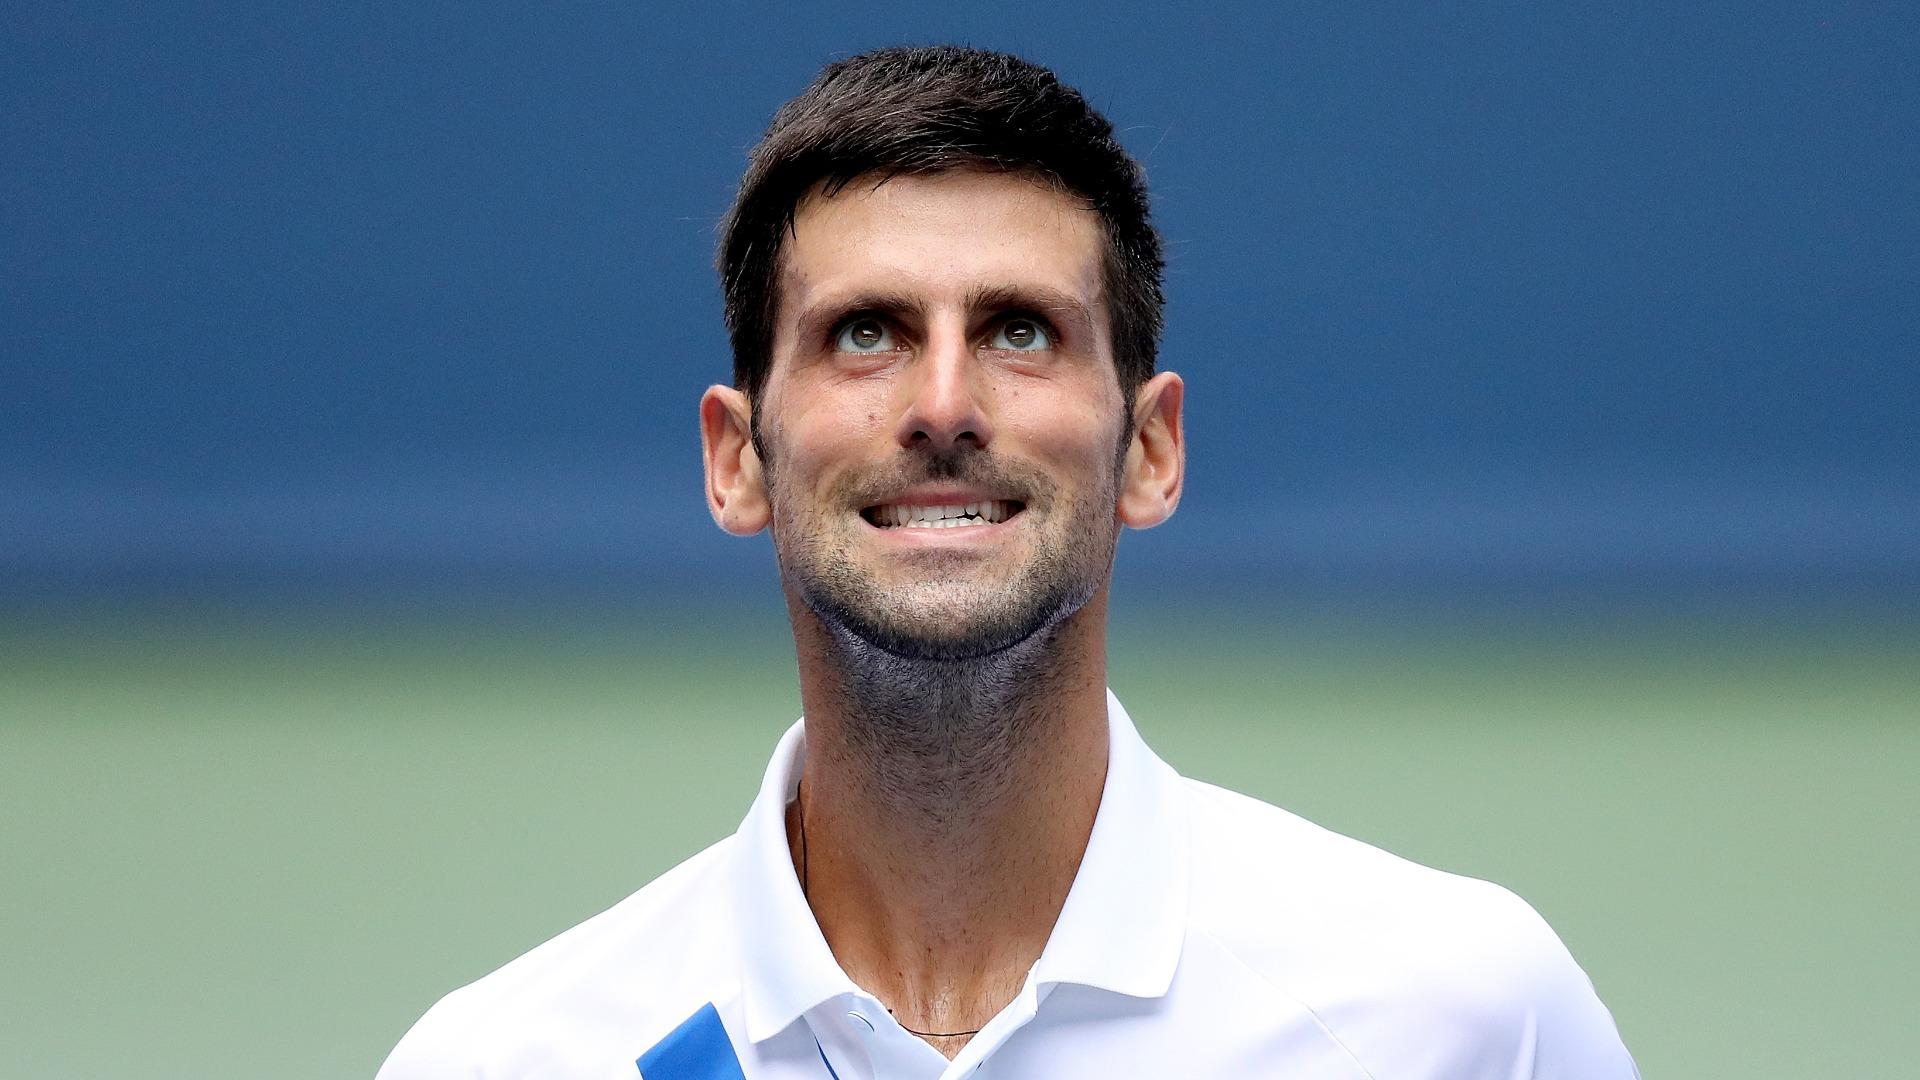 Novak Djokovic - Cincinnati 2020